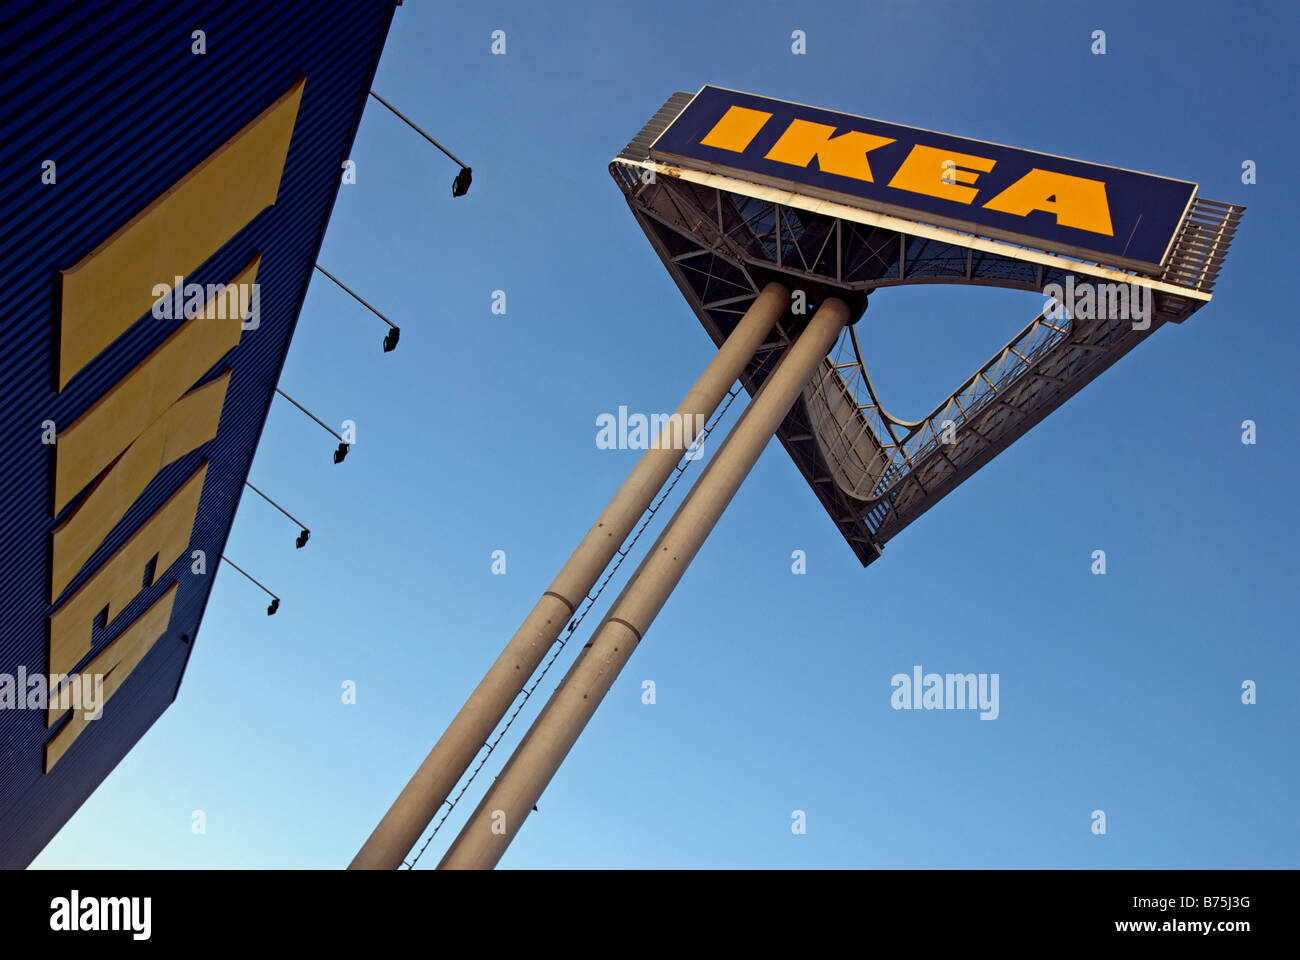 Ikea Superstore Godorf Cologne North Rhine Westphalia Germany